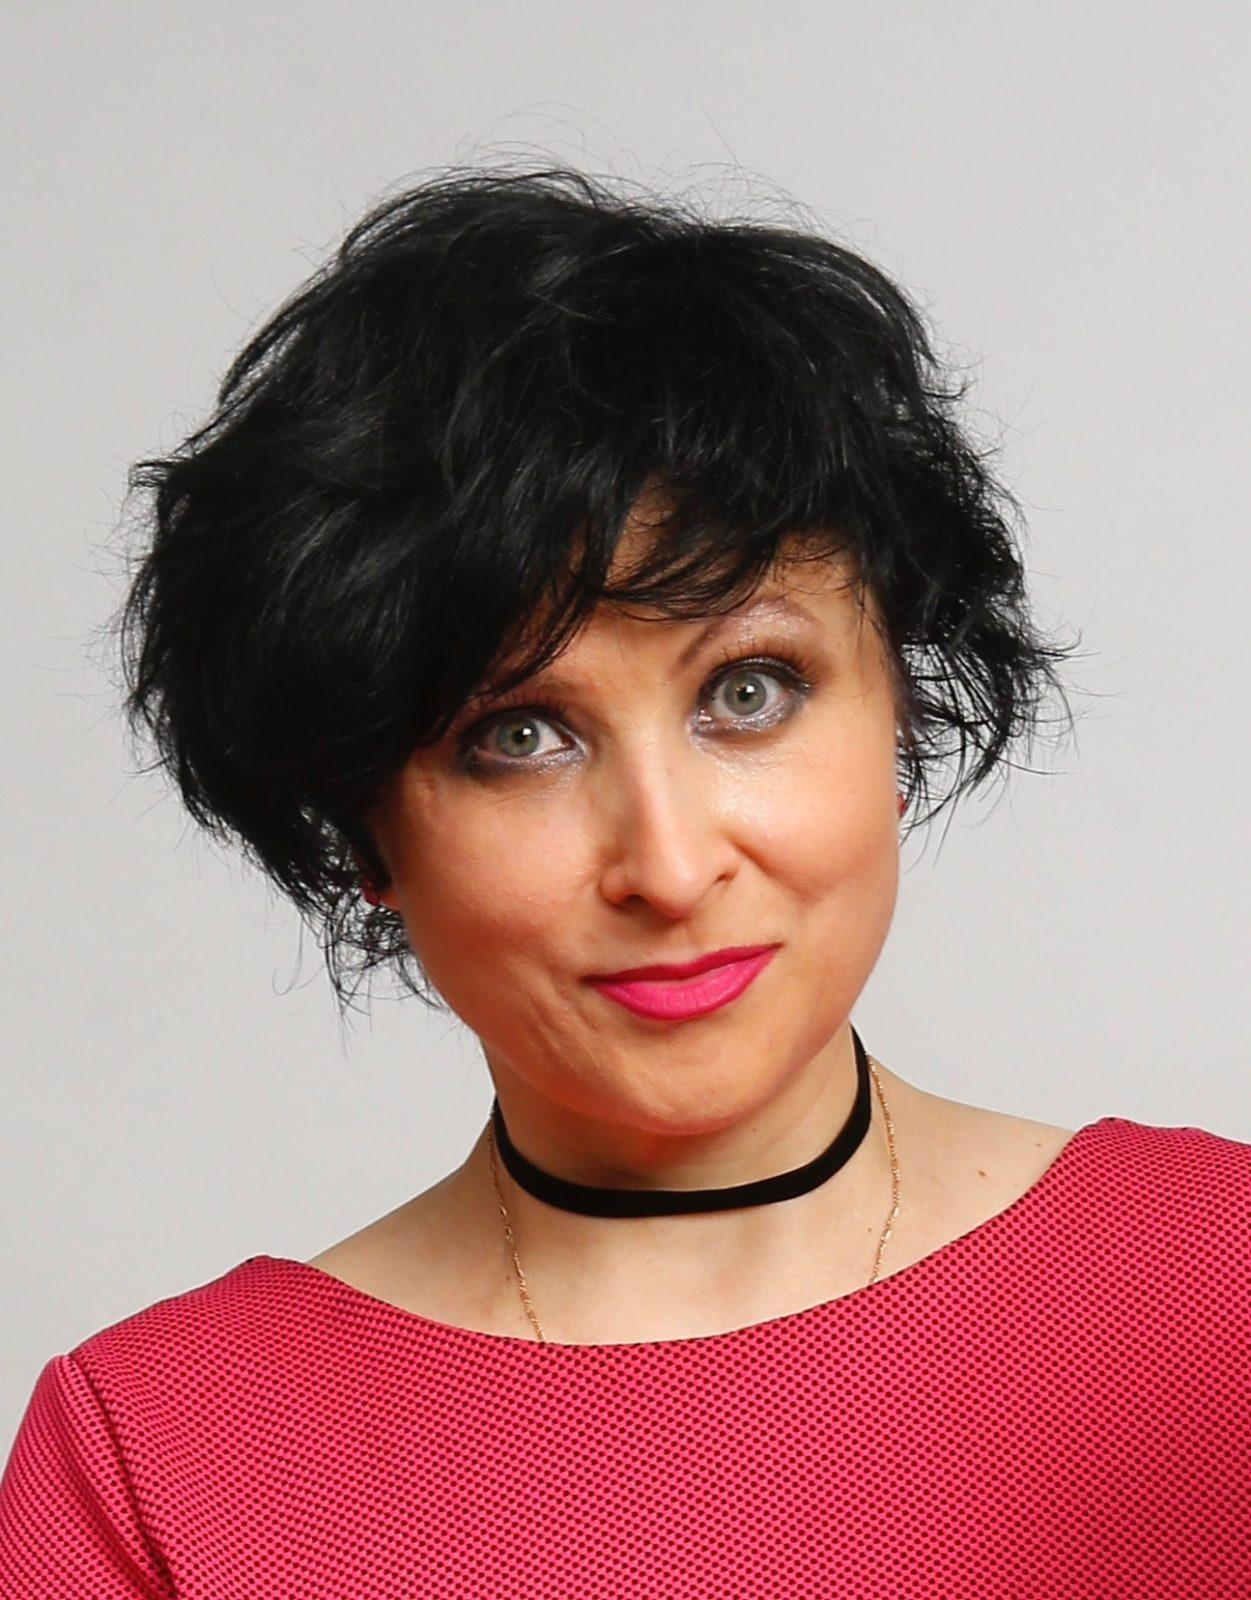 Презентация певицы Алены Даль в ресторане Гладиатор 1